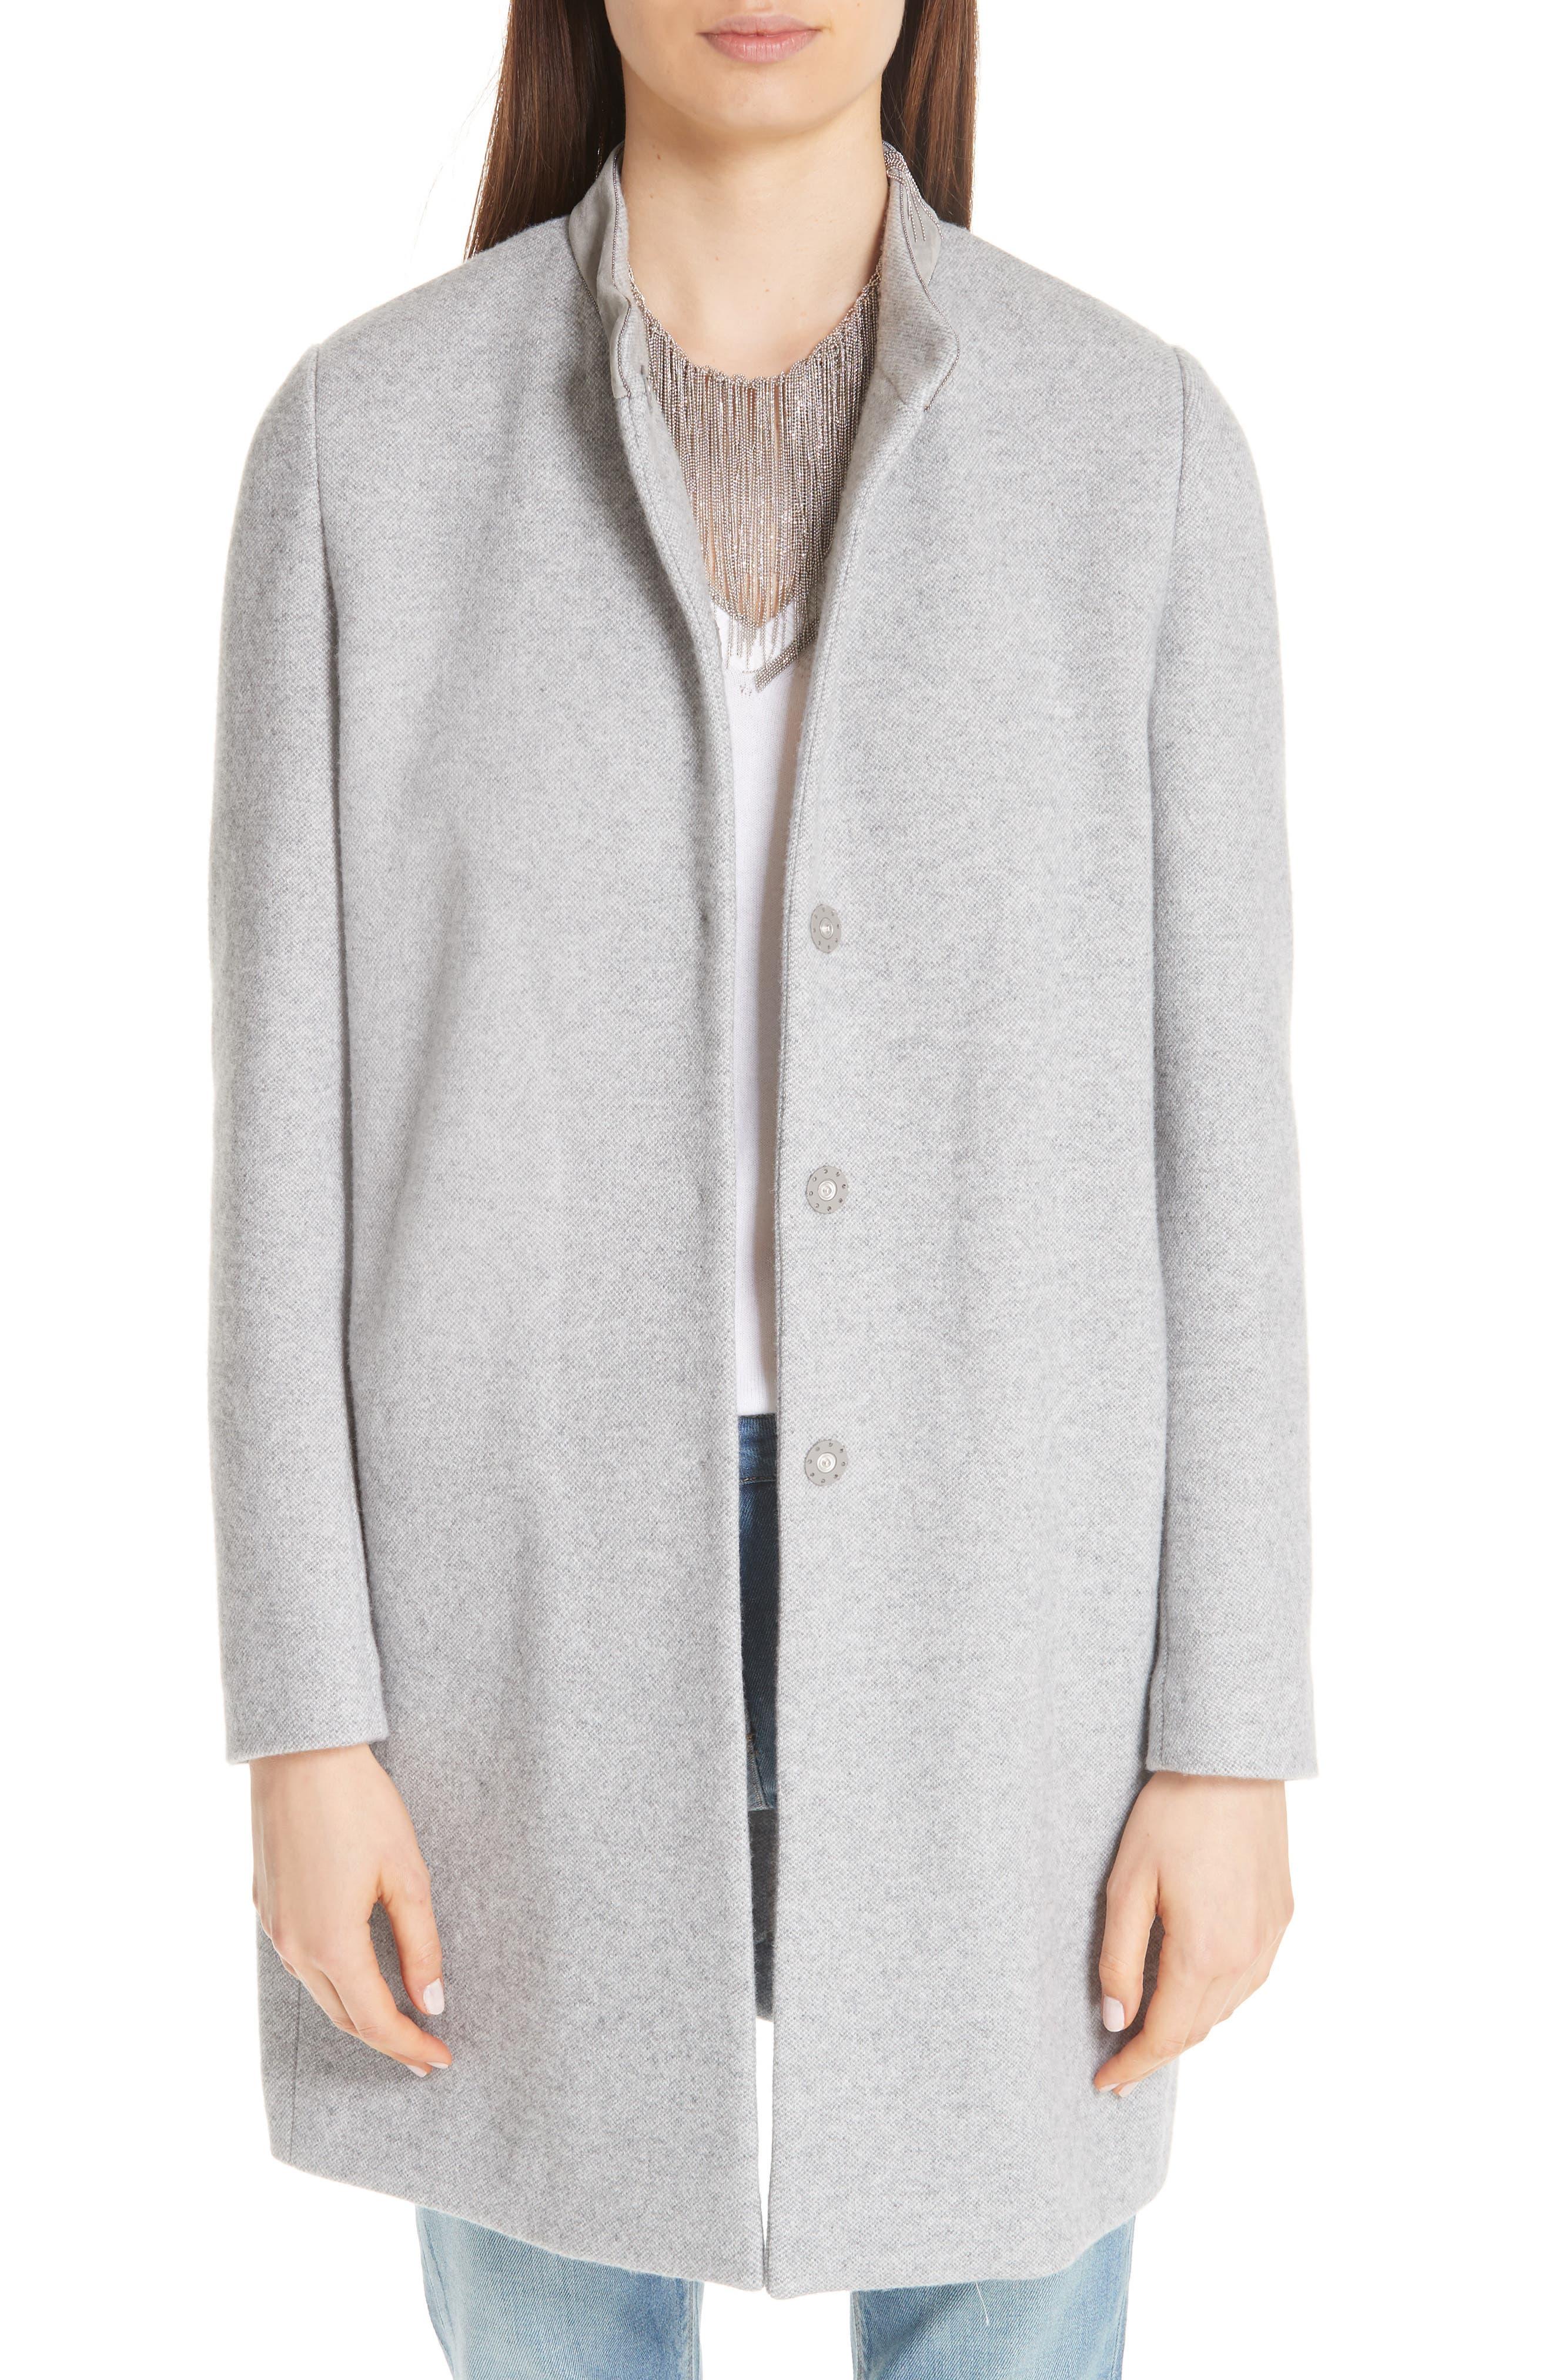 FABIANA FILIPPI Suede Trim Tweed Jacket, Main, color, GREY